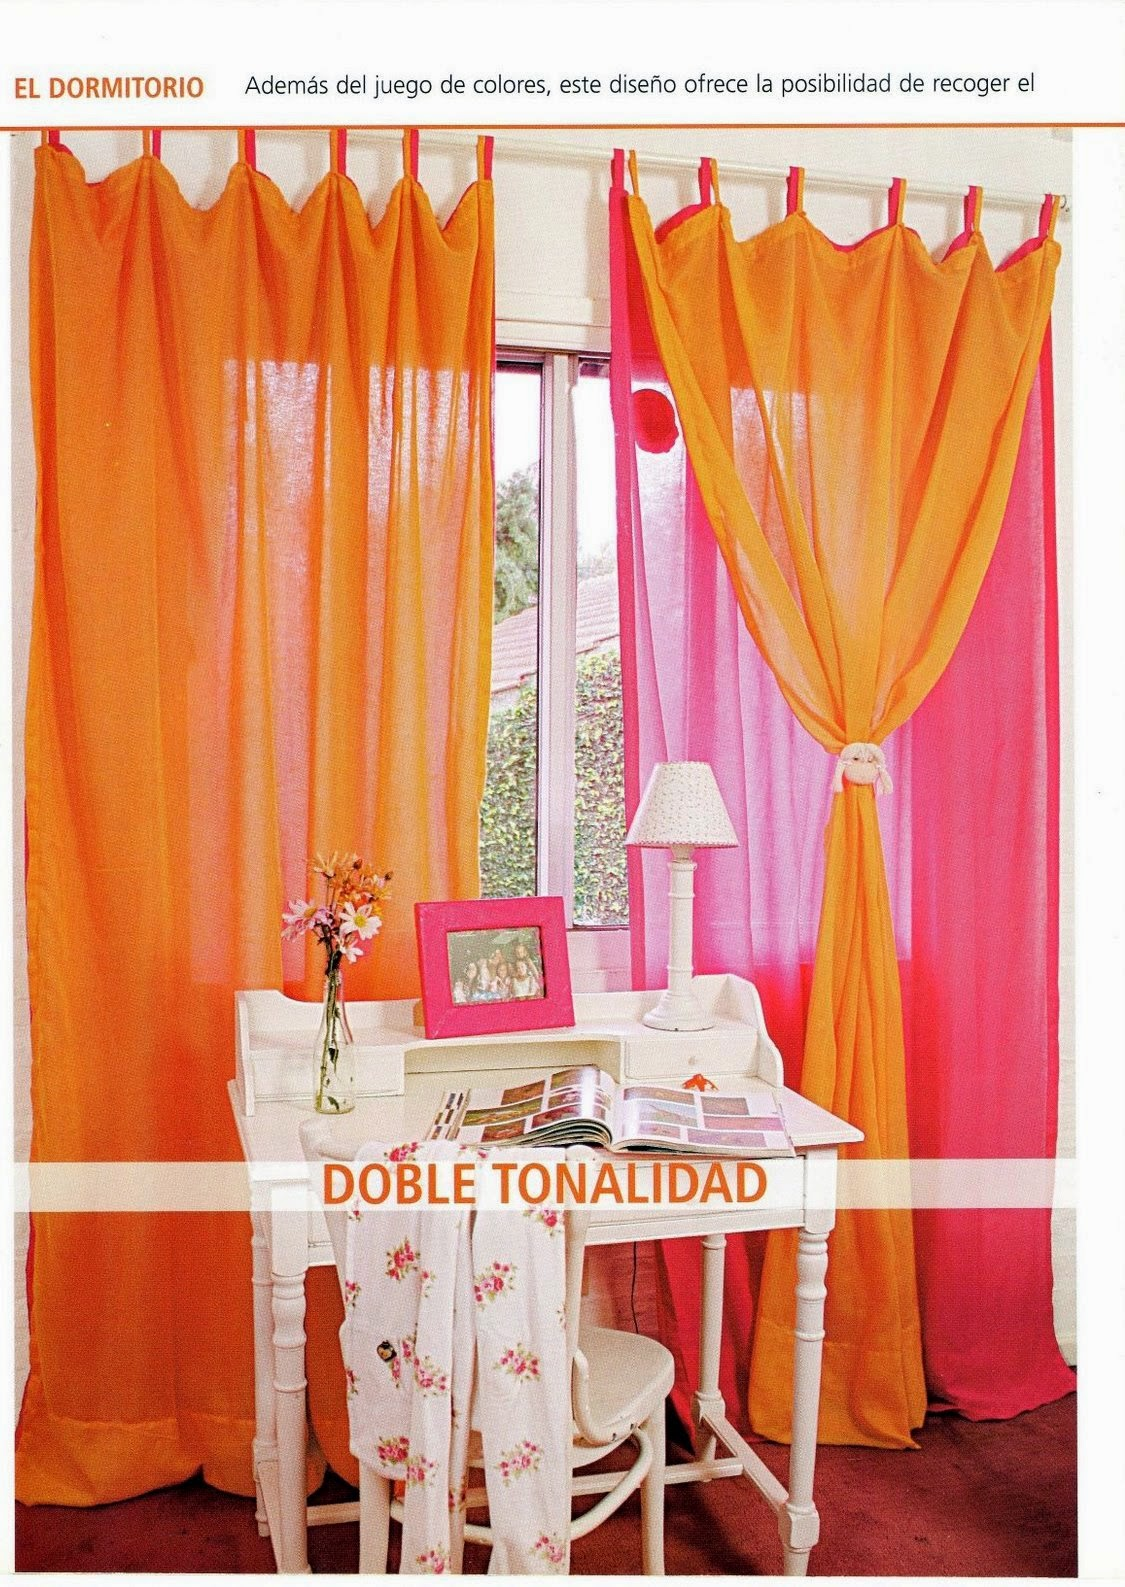 Como hacer cortinas paso a paso revistas de manualidades for Cortinas para muebles de cocina